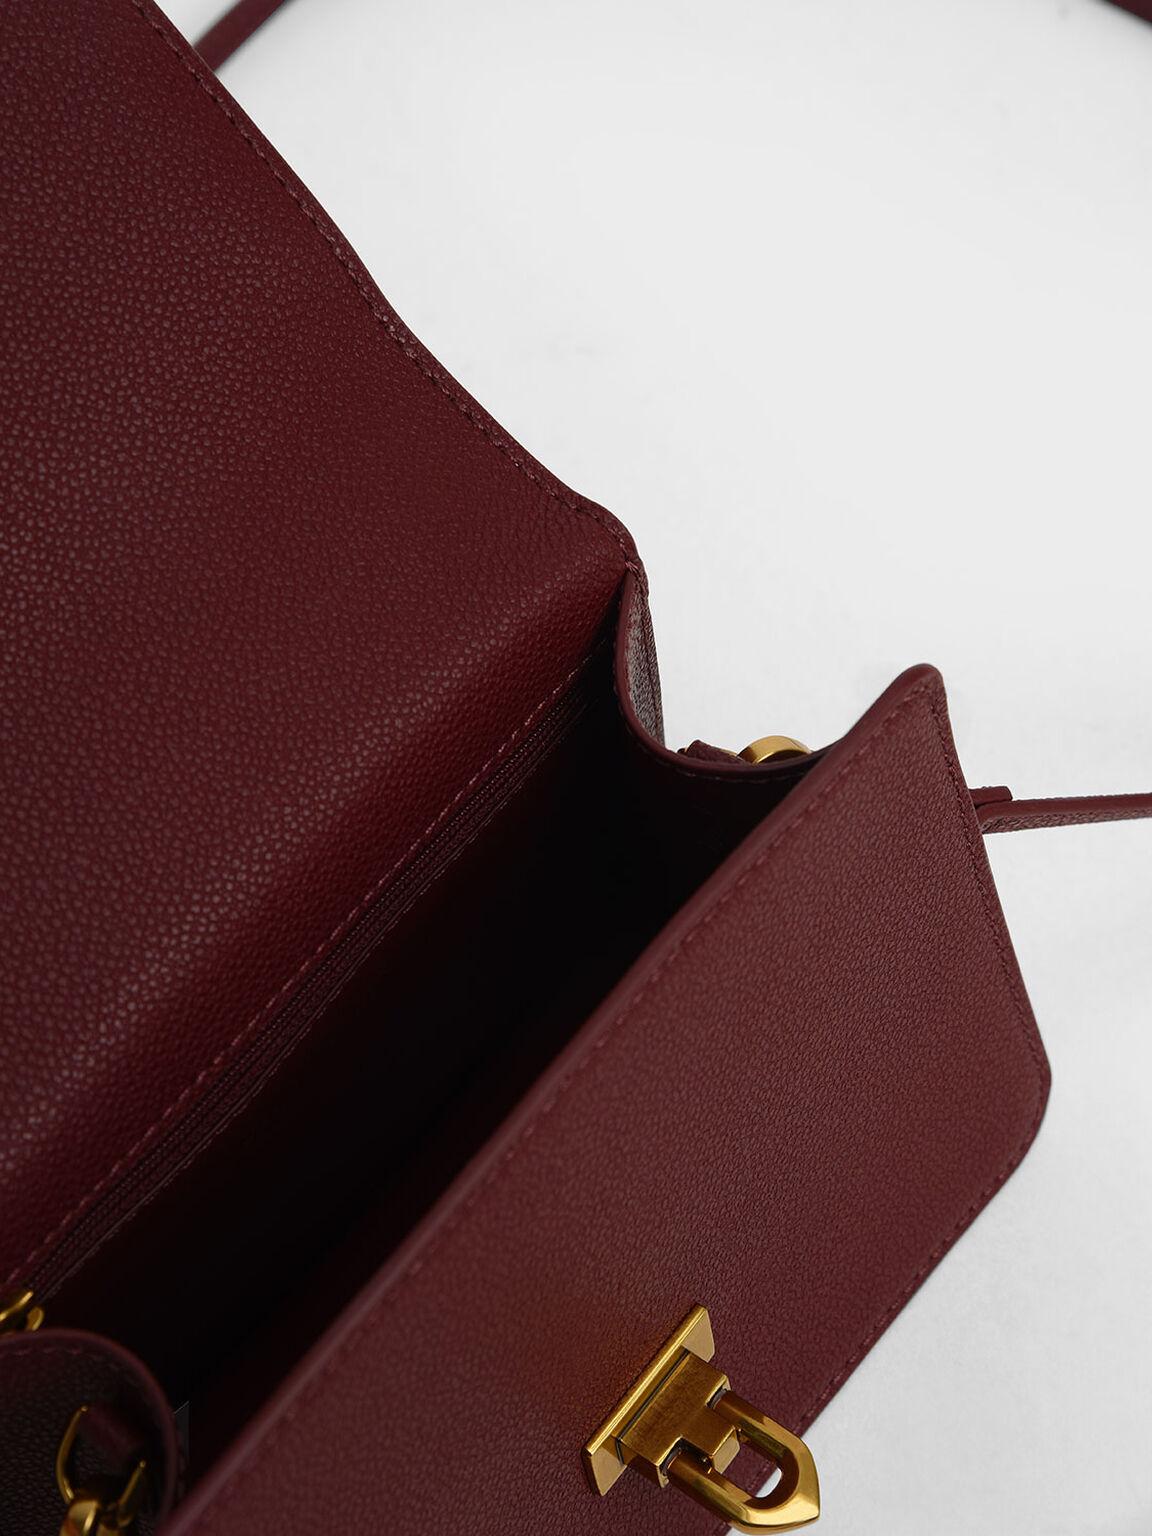 金扣掀蓋手提包, 酒紅色, hi-res